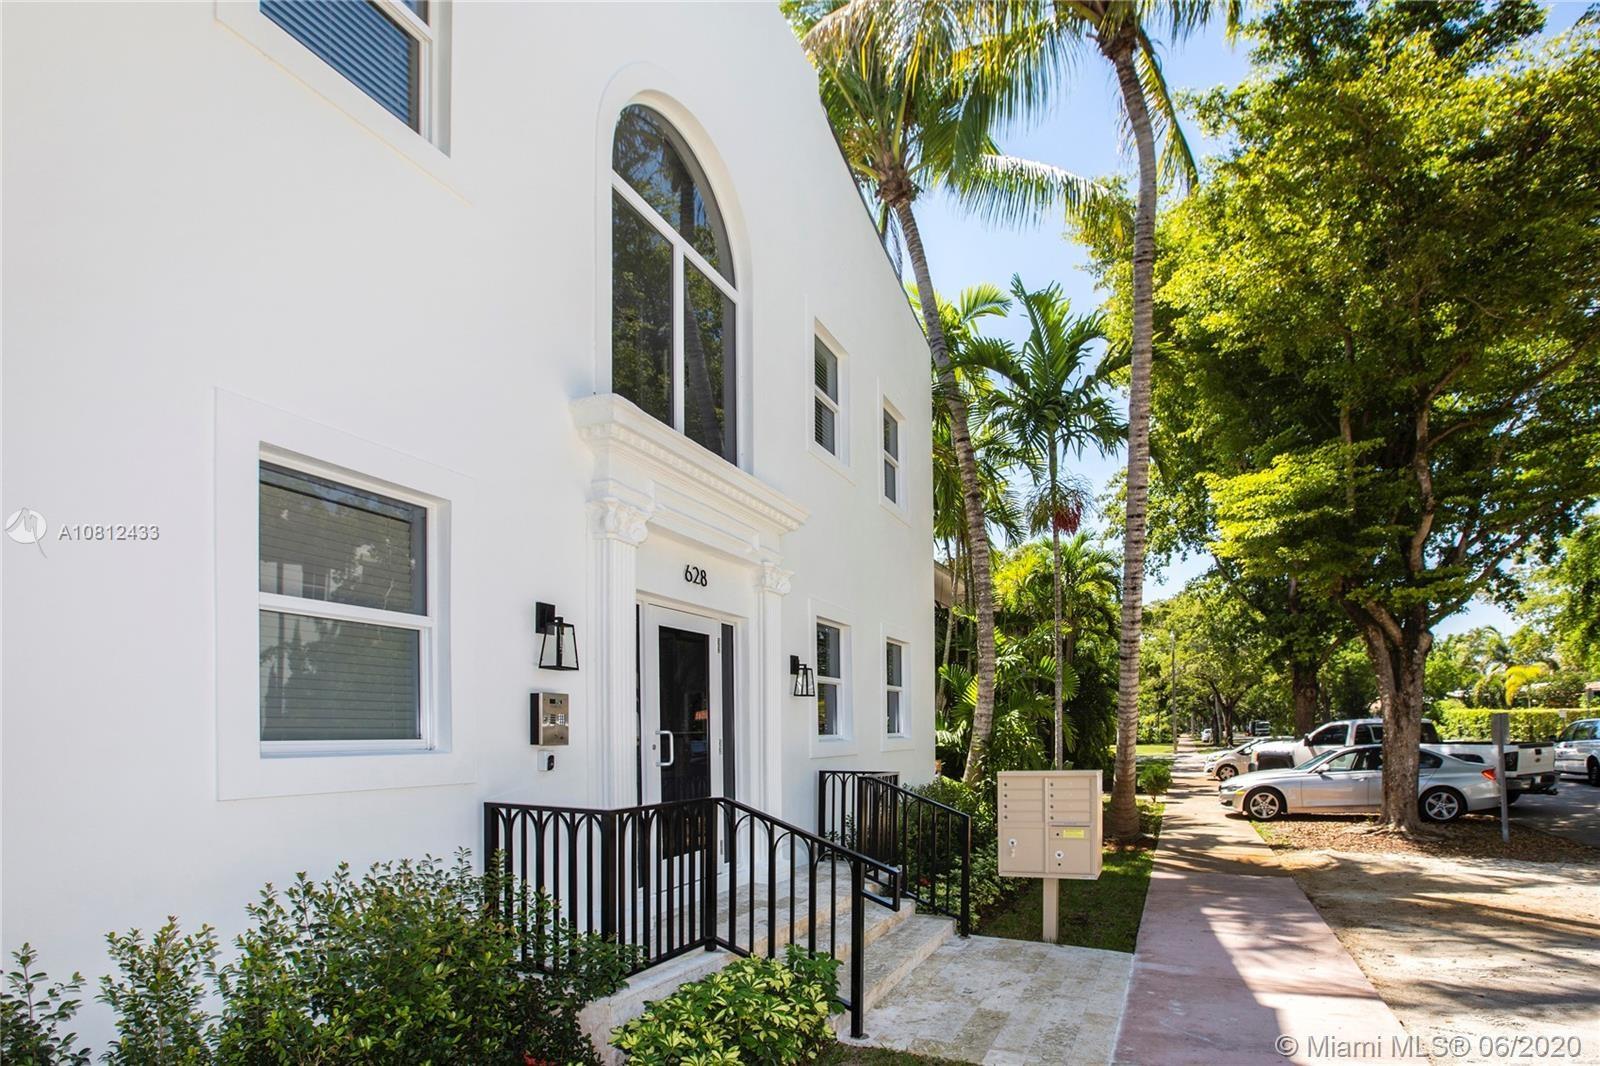 624-628  Santander Ave, Coral Gables, FL 33134